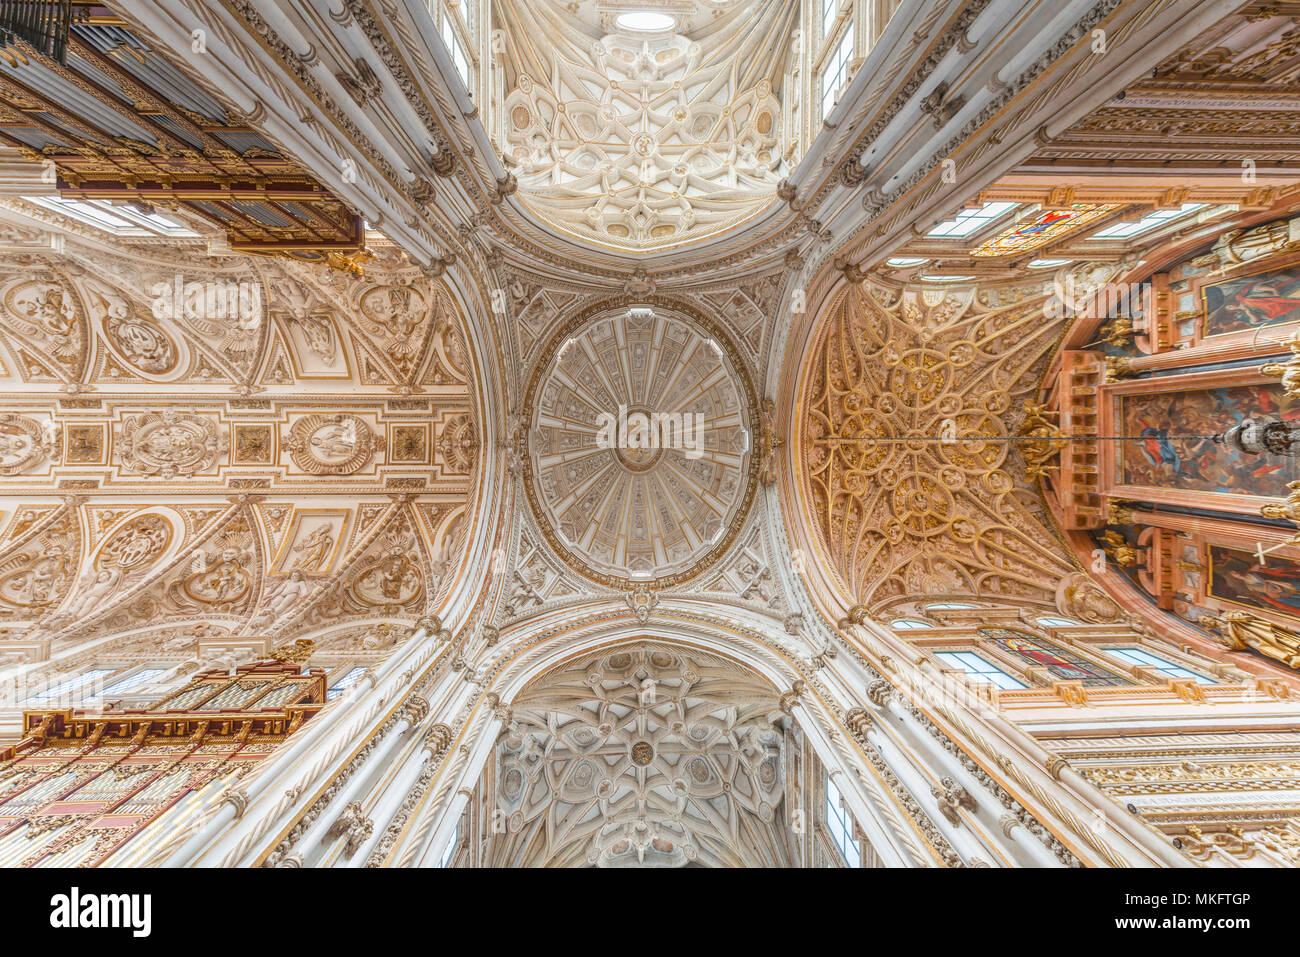 Soffitti A Volta Decorazioni : Decorazioni per soffitti u idea d immagine di decorazione